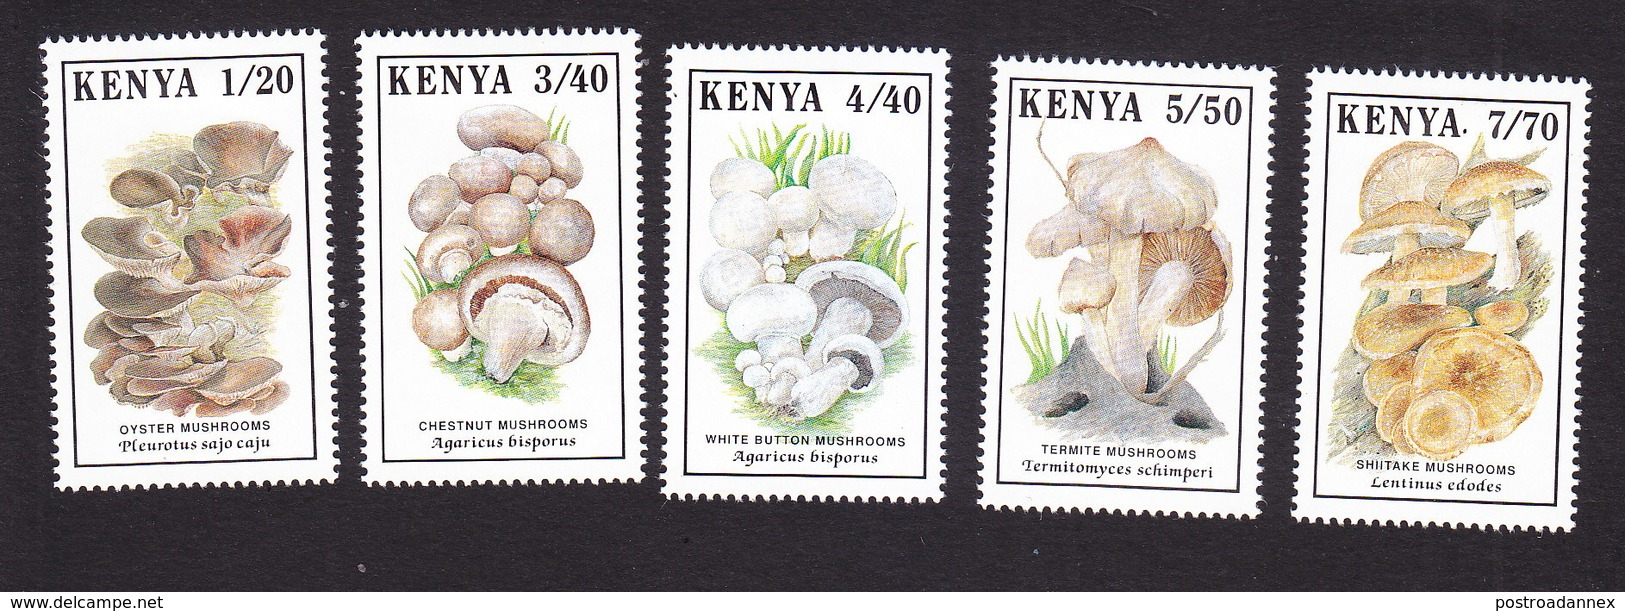 Kenya, Scott #496-500, Mint Hinged, Mushrooms, Issued 1989 - Kenya (1963-...)